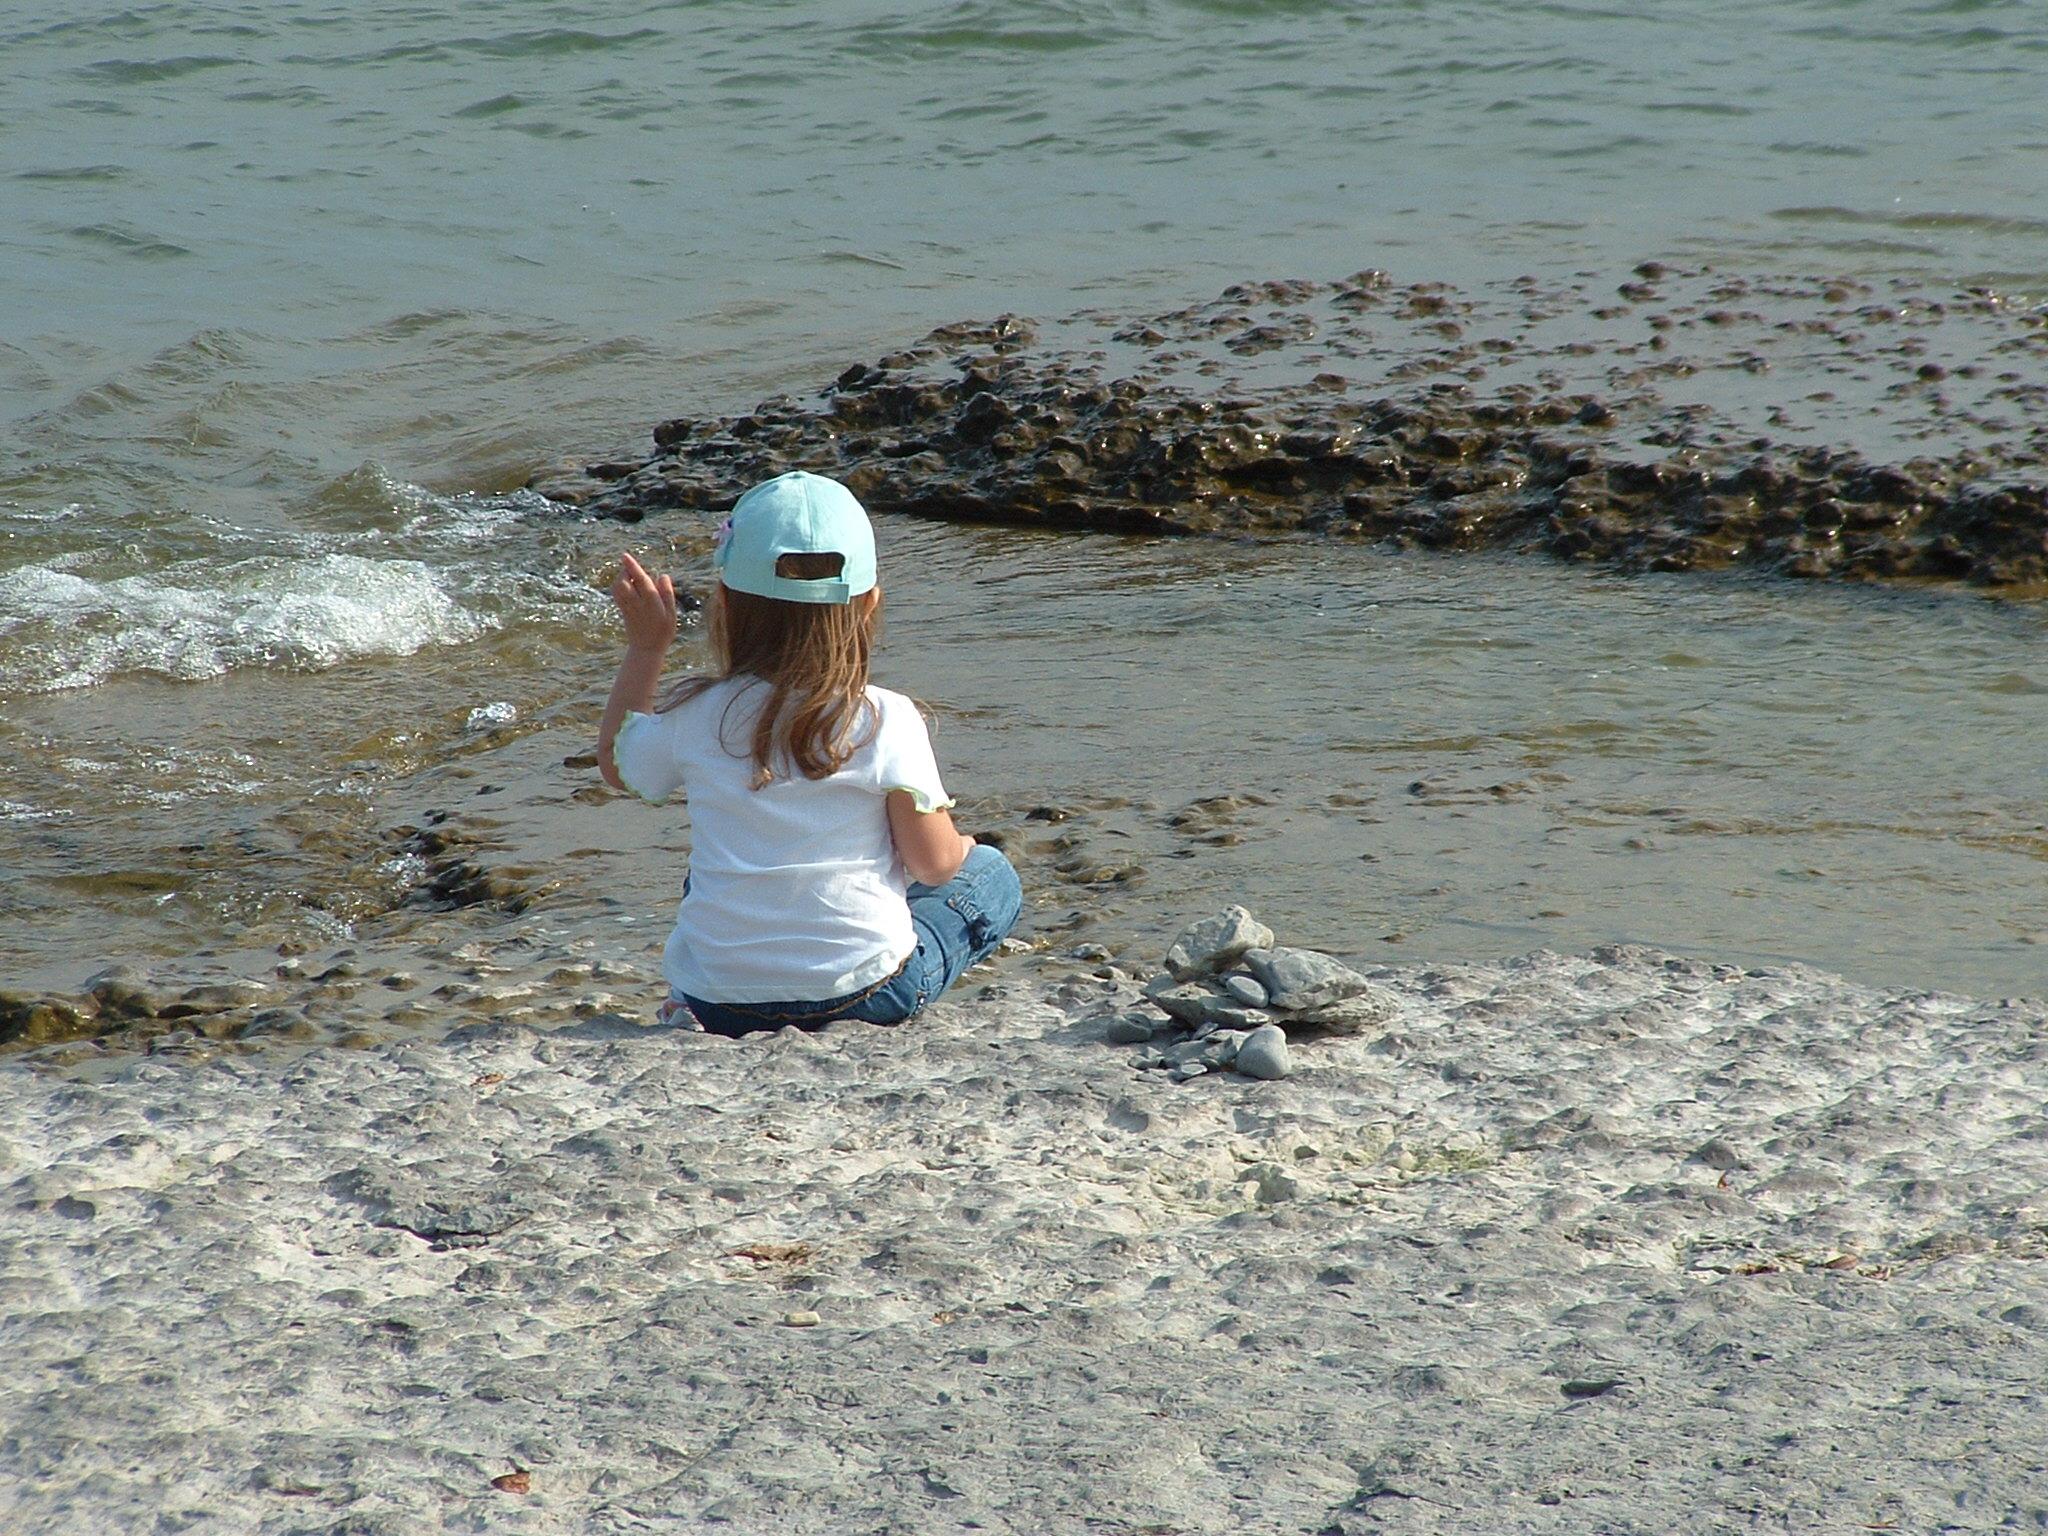 Skipping stones at beach photo